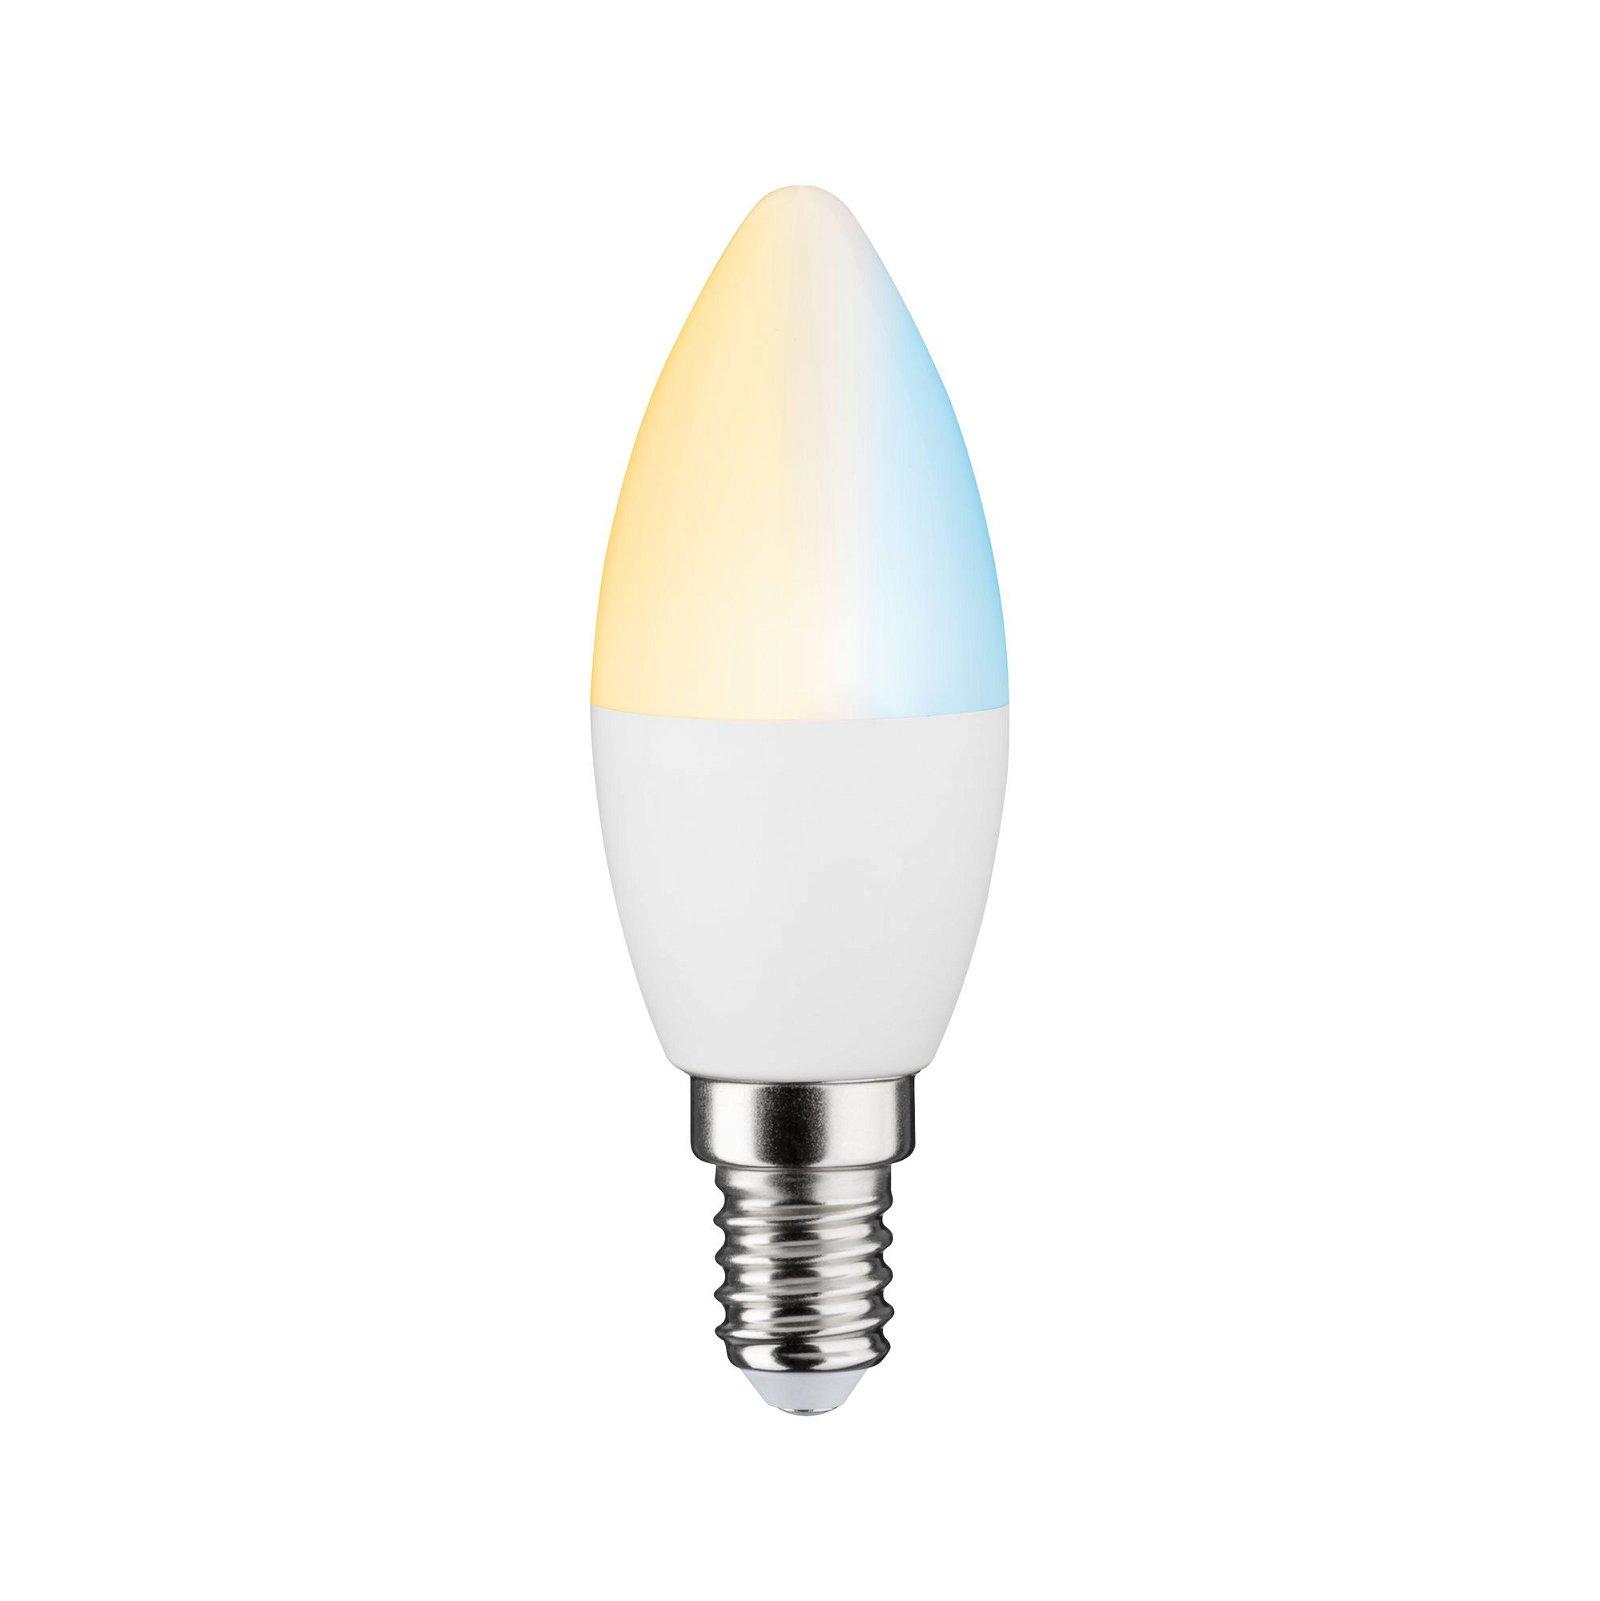 LED Kerze Smart Home Zigbee E14 230V 400lm 5W Tunable White Matt